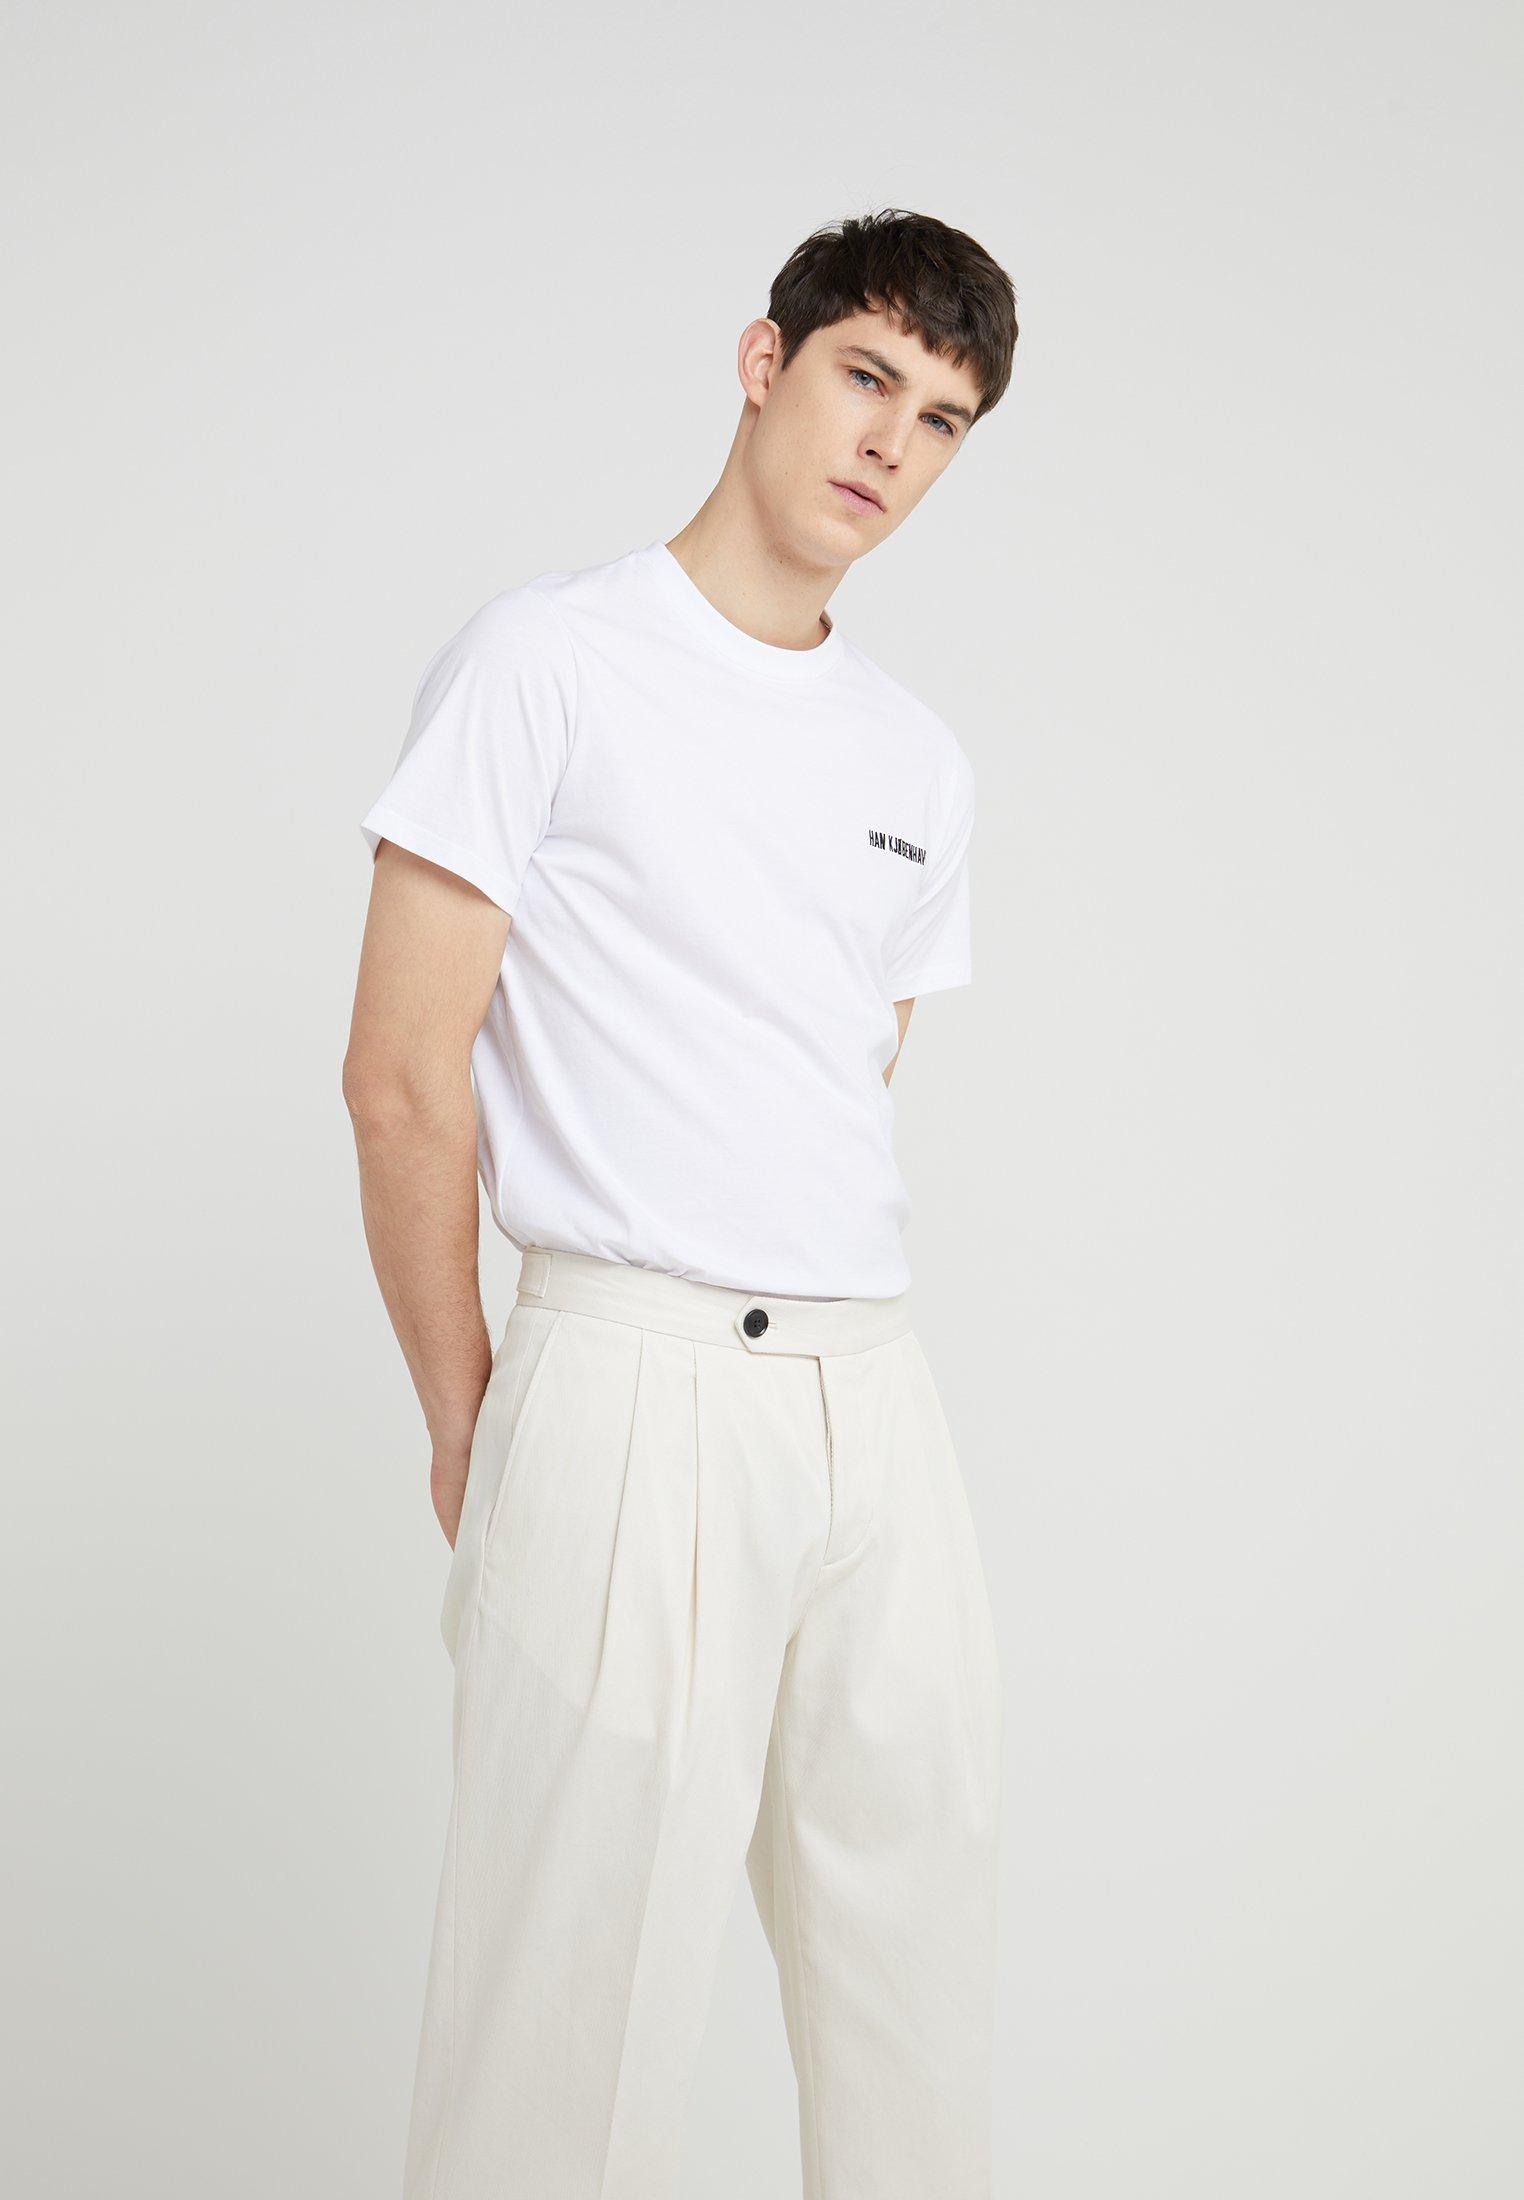 TeeT White Basique Han Casual Kjobenhavn shirt 5L3jqcAR4